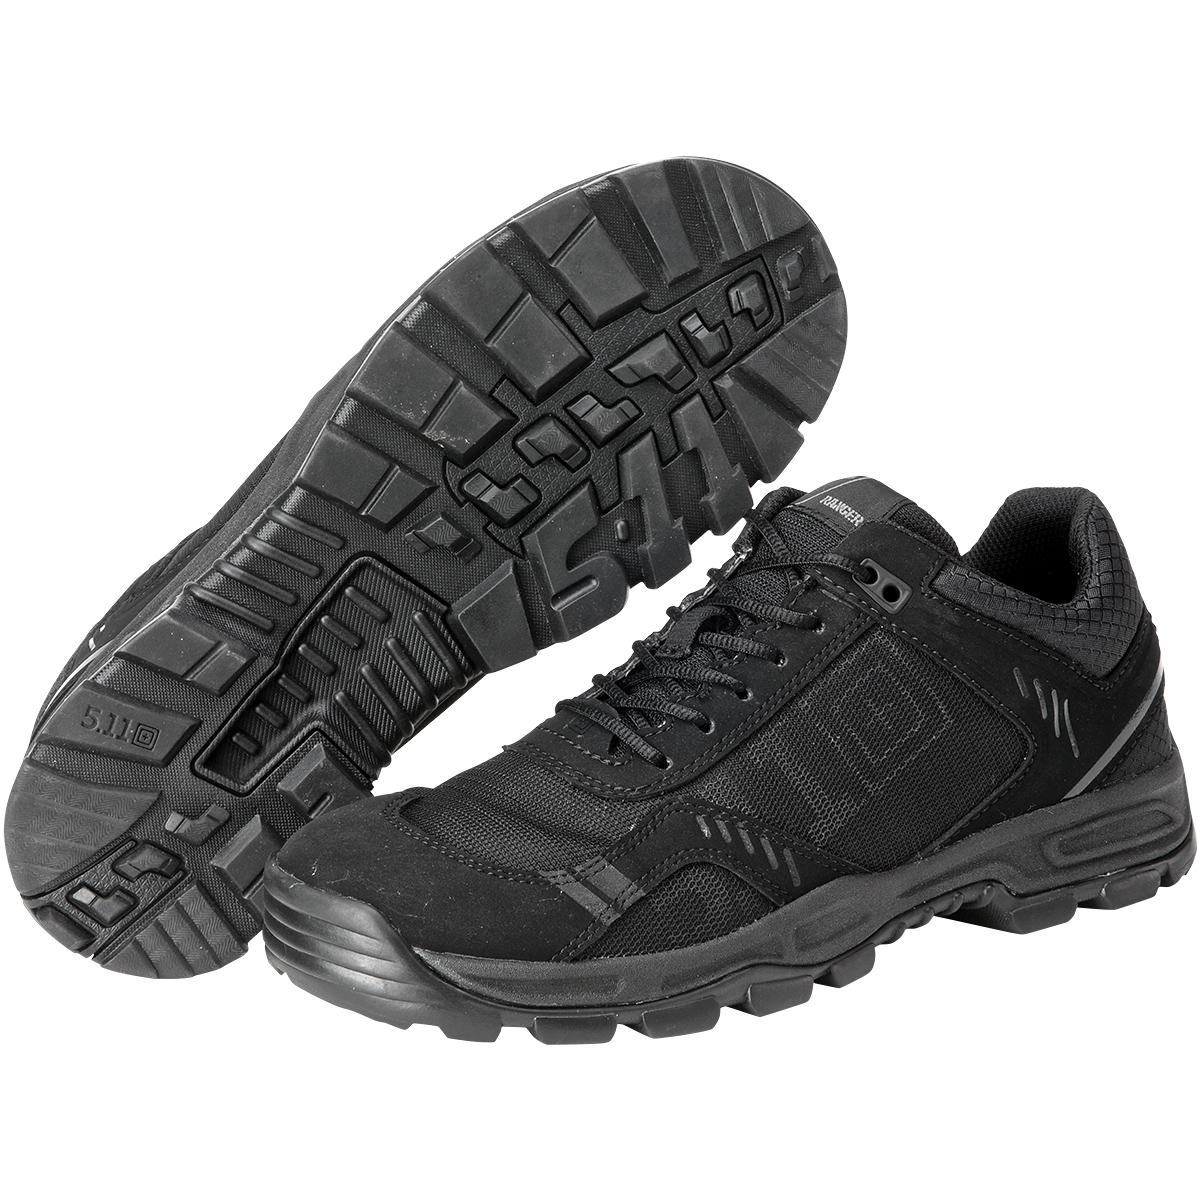 511 Ranger Boots Black